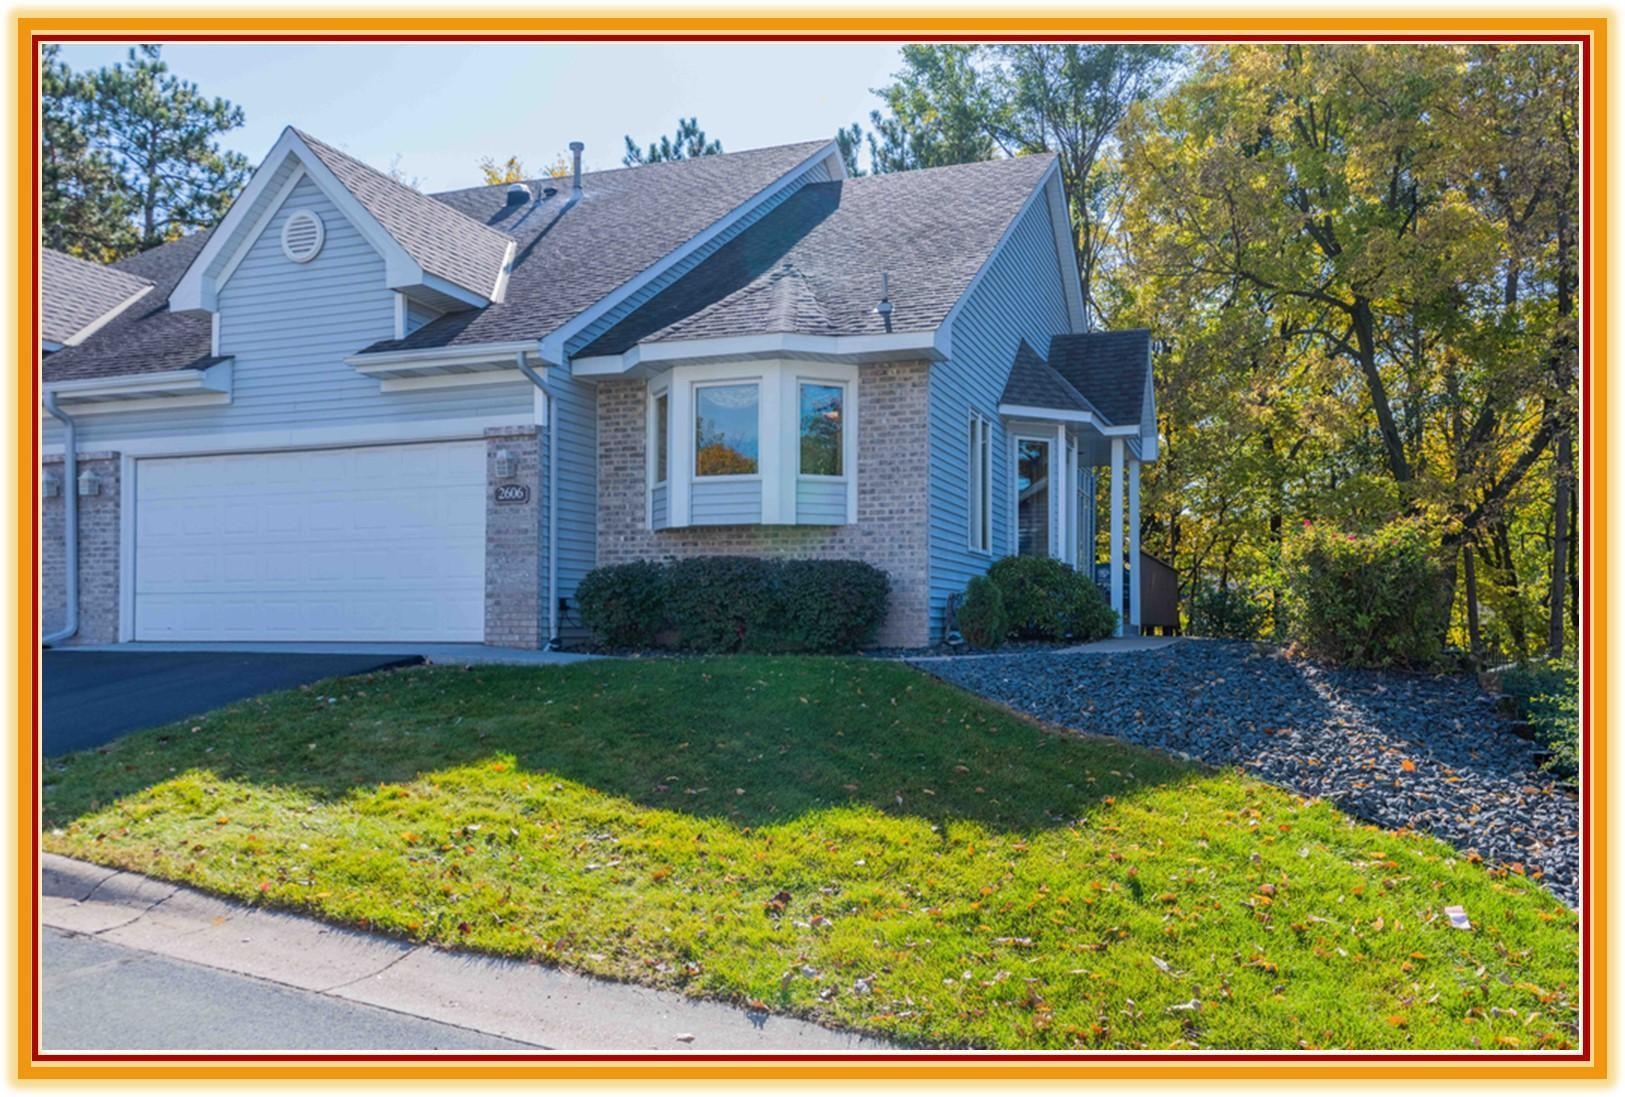 2606 Rivers Bluff Lane Property Photo - Anoka, MN real estate listing